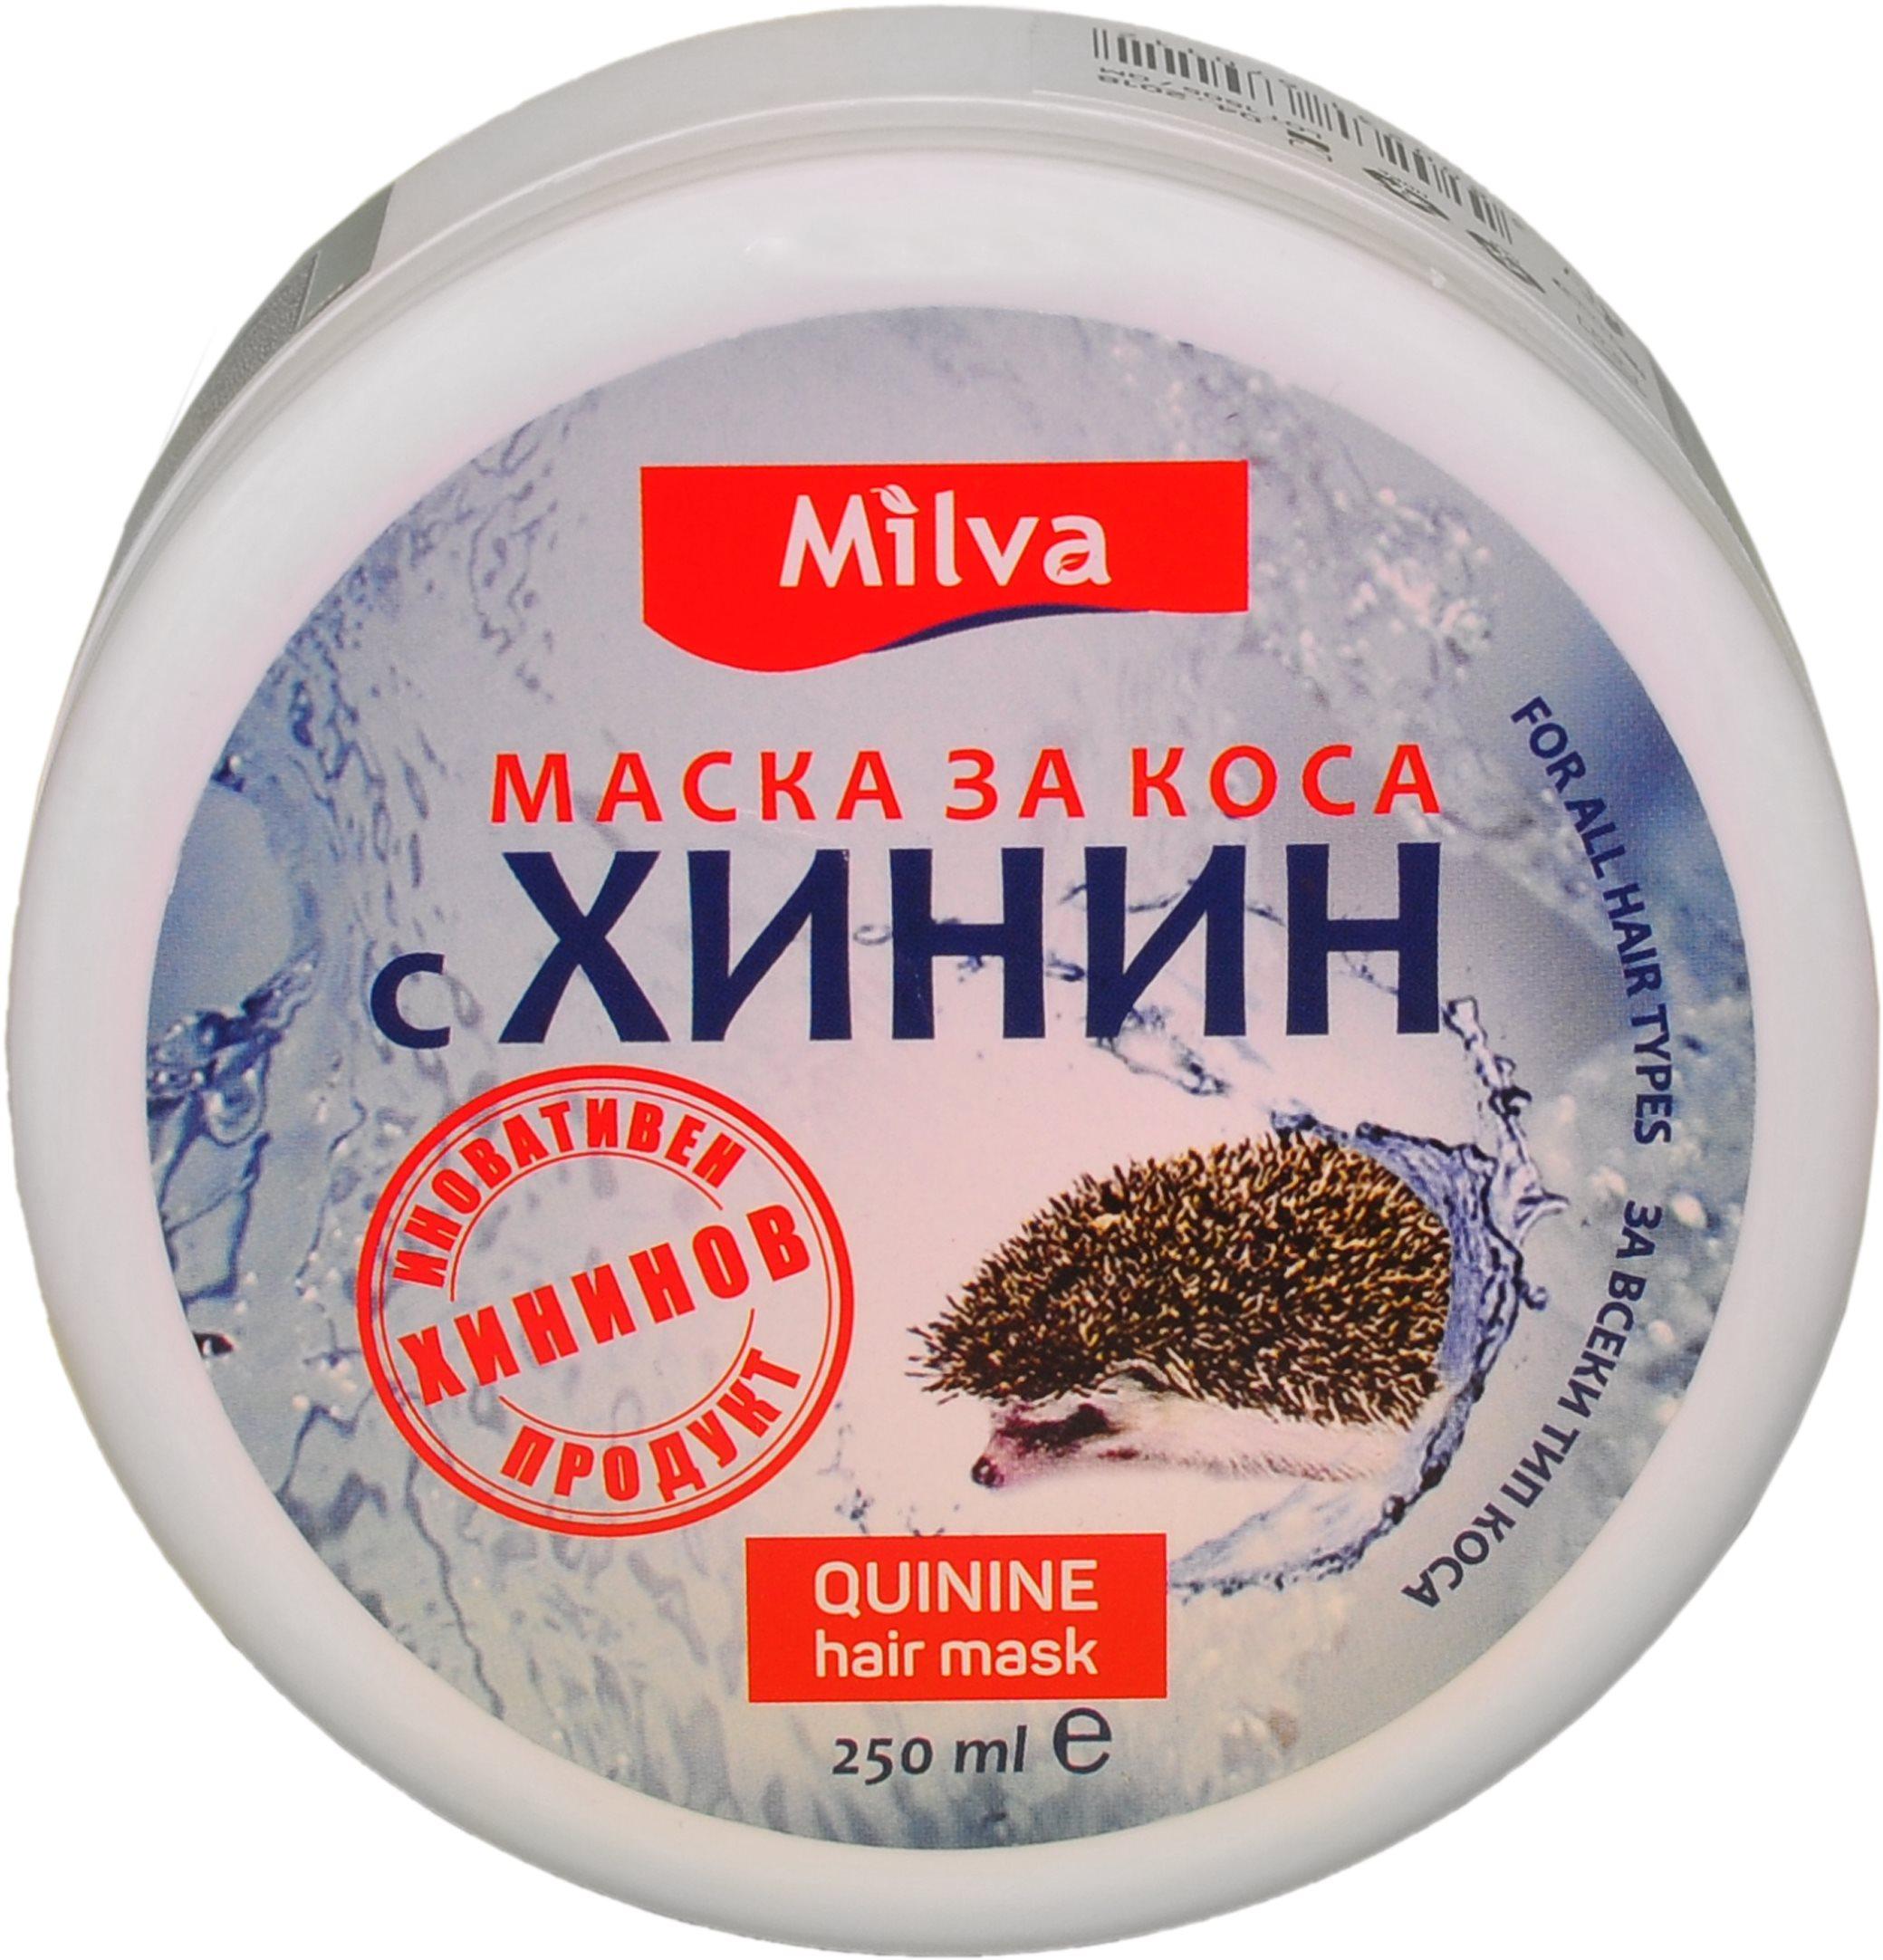 MILVA Kinin maszk 250 ml